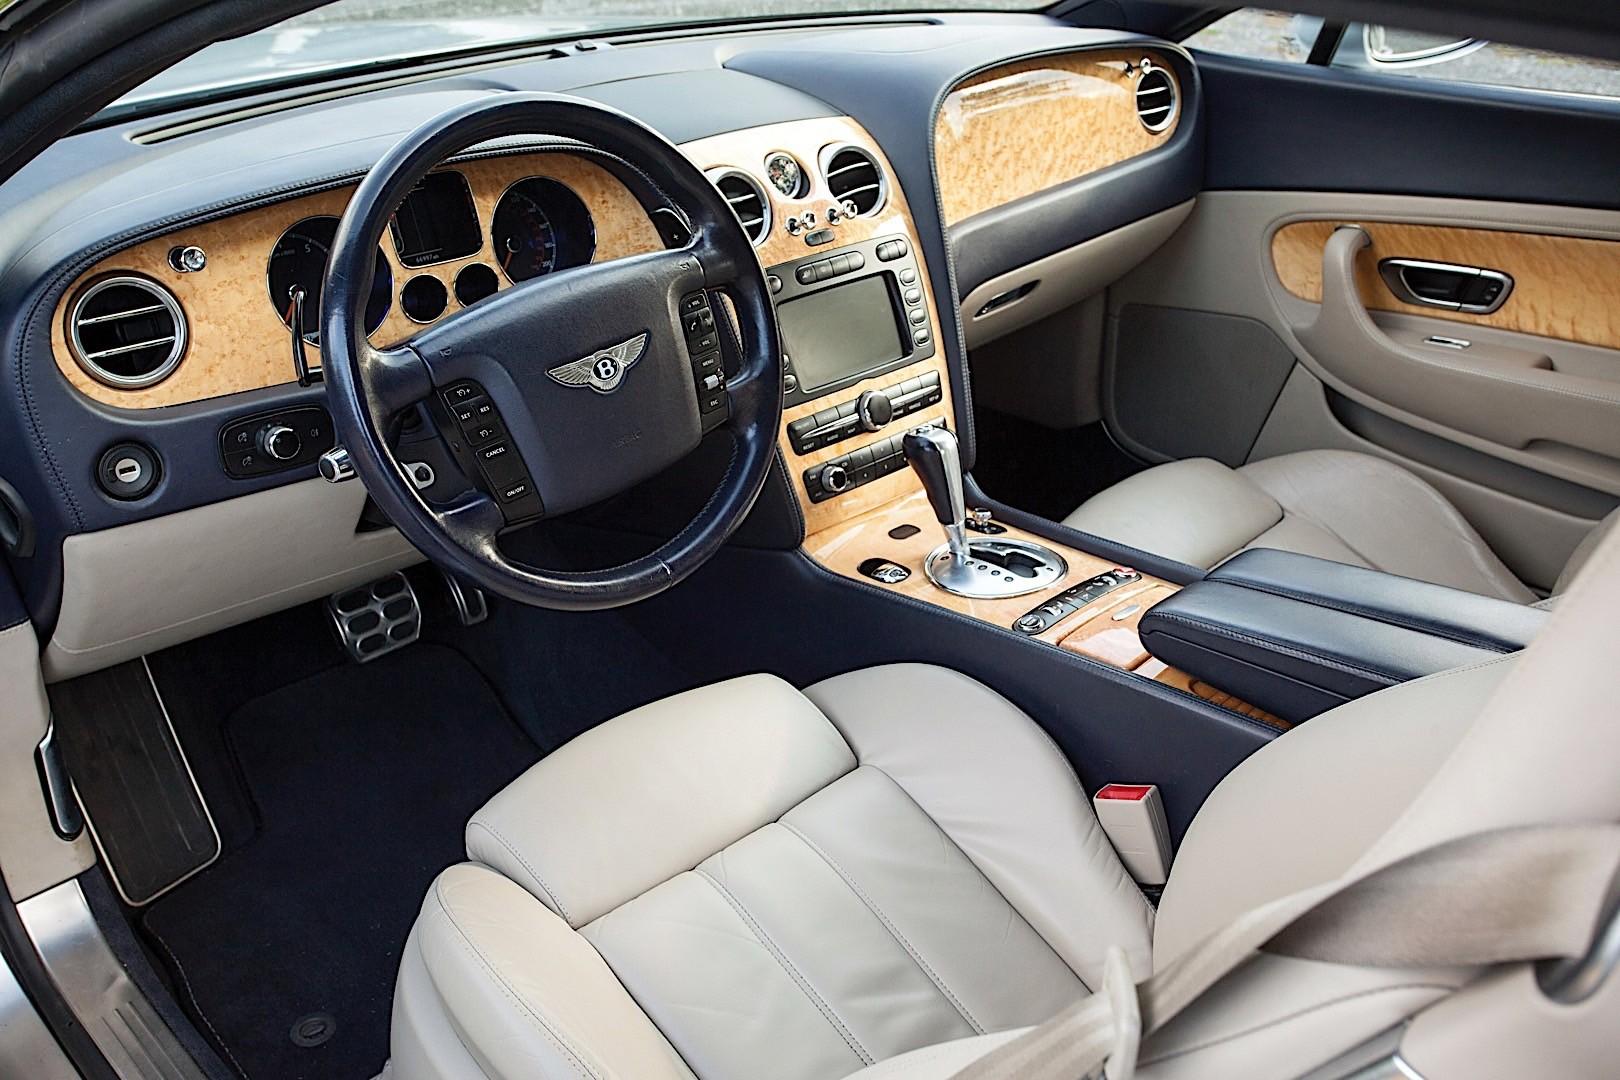 Bentley Continental Gt Specs Photos 2003 2004 2005 2006 2007 2008 2009 2010 Autoevolution